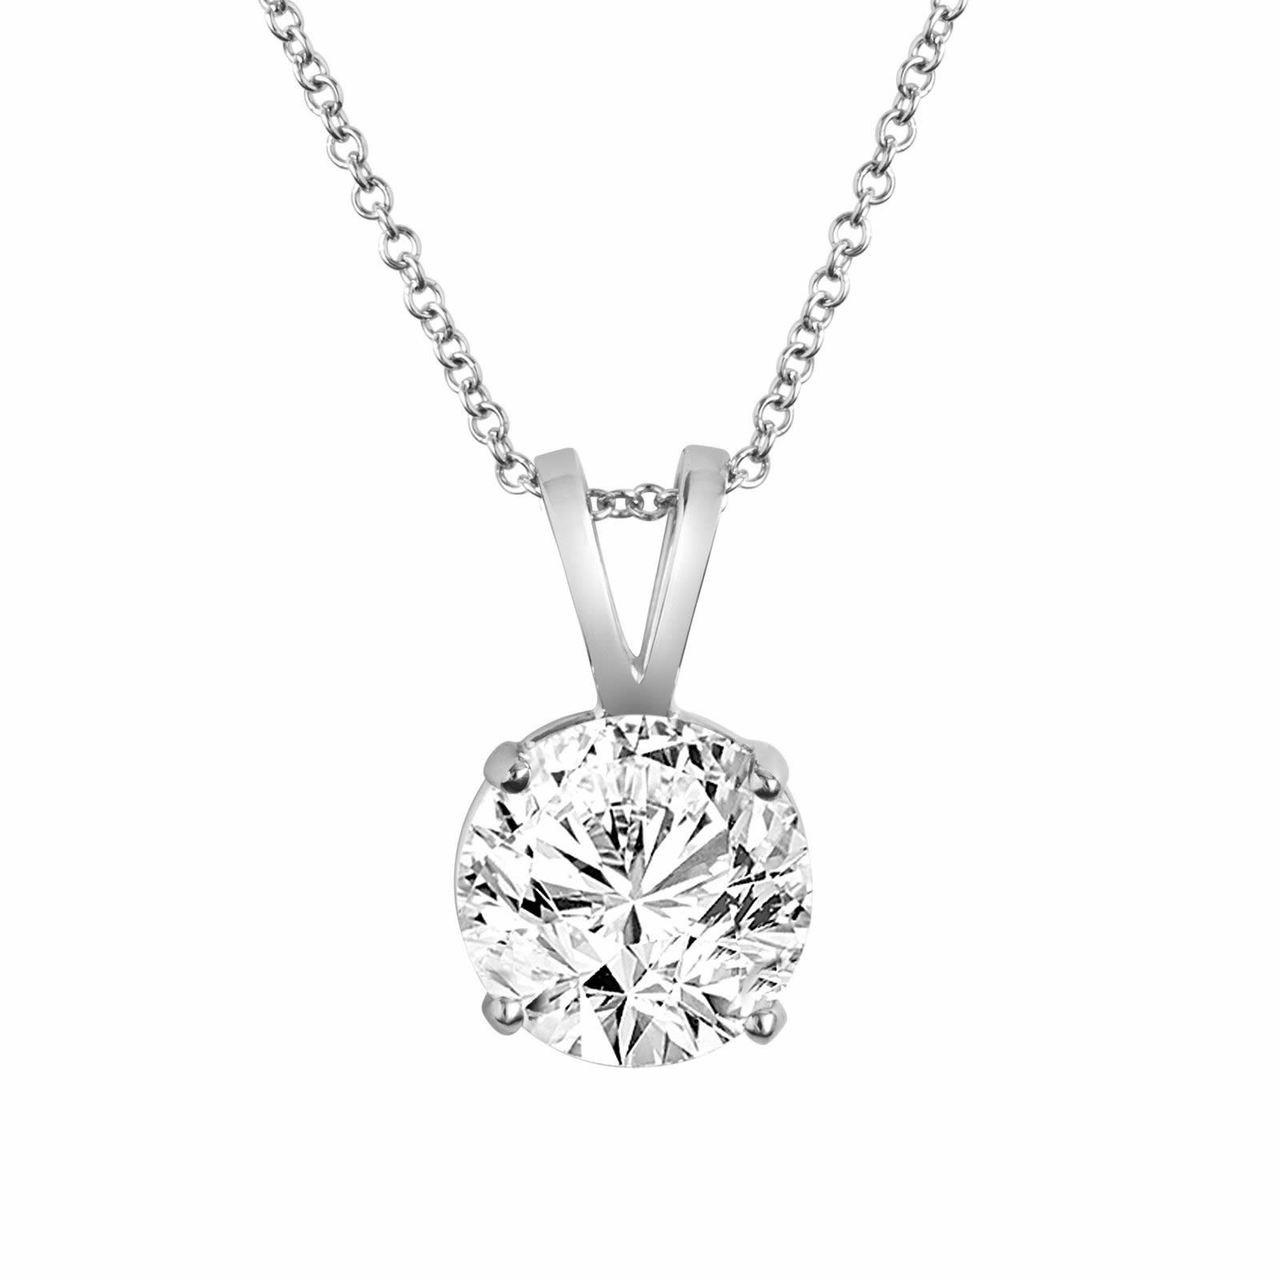 03e02e9c8b1ef Natural Diamond Solitaire Pendant Necklace 1.01 Carat 14K White Gold  handmade Certified